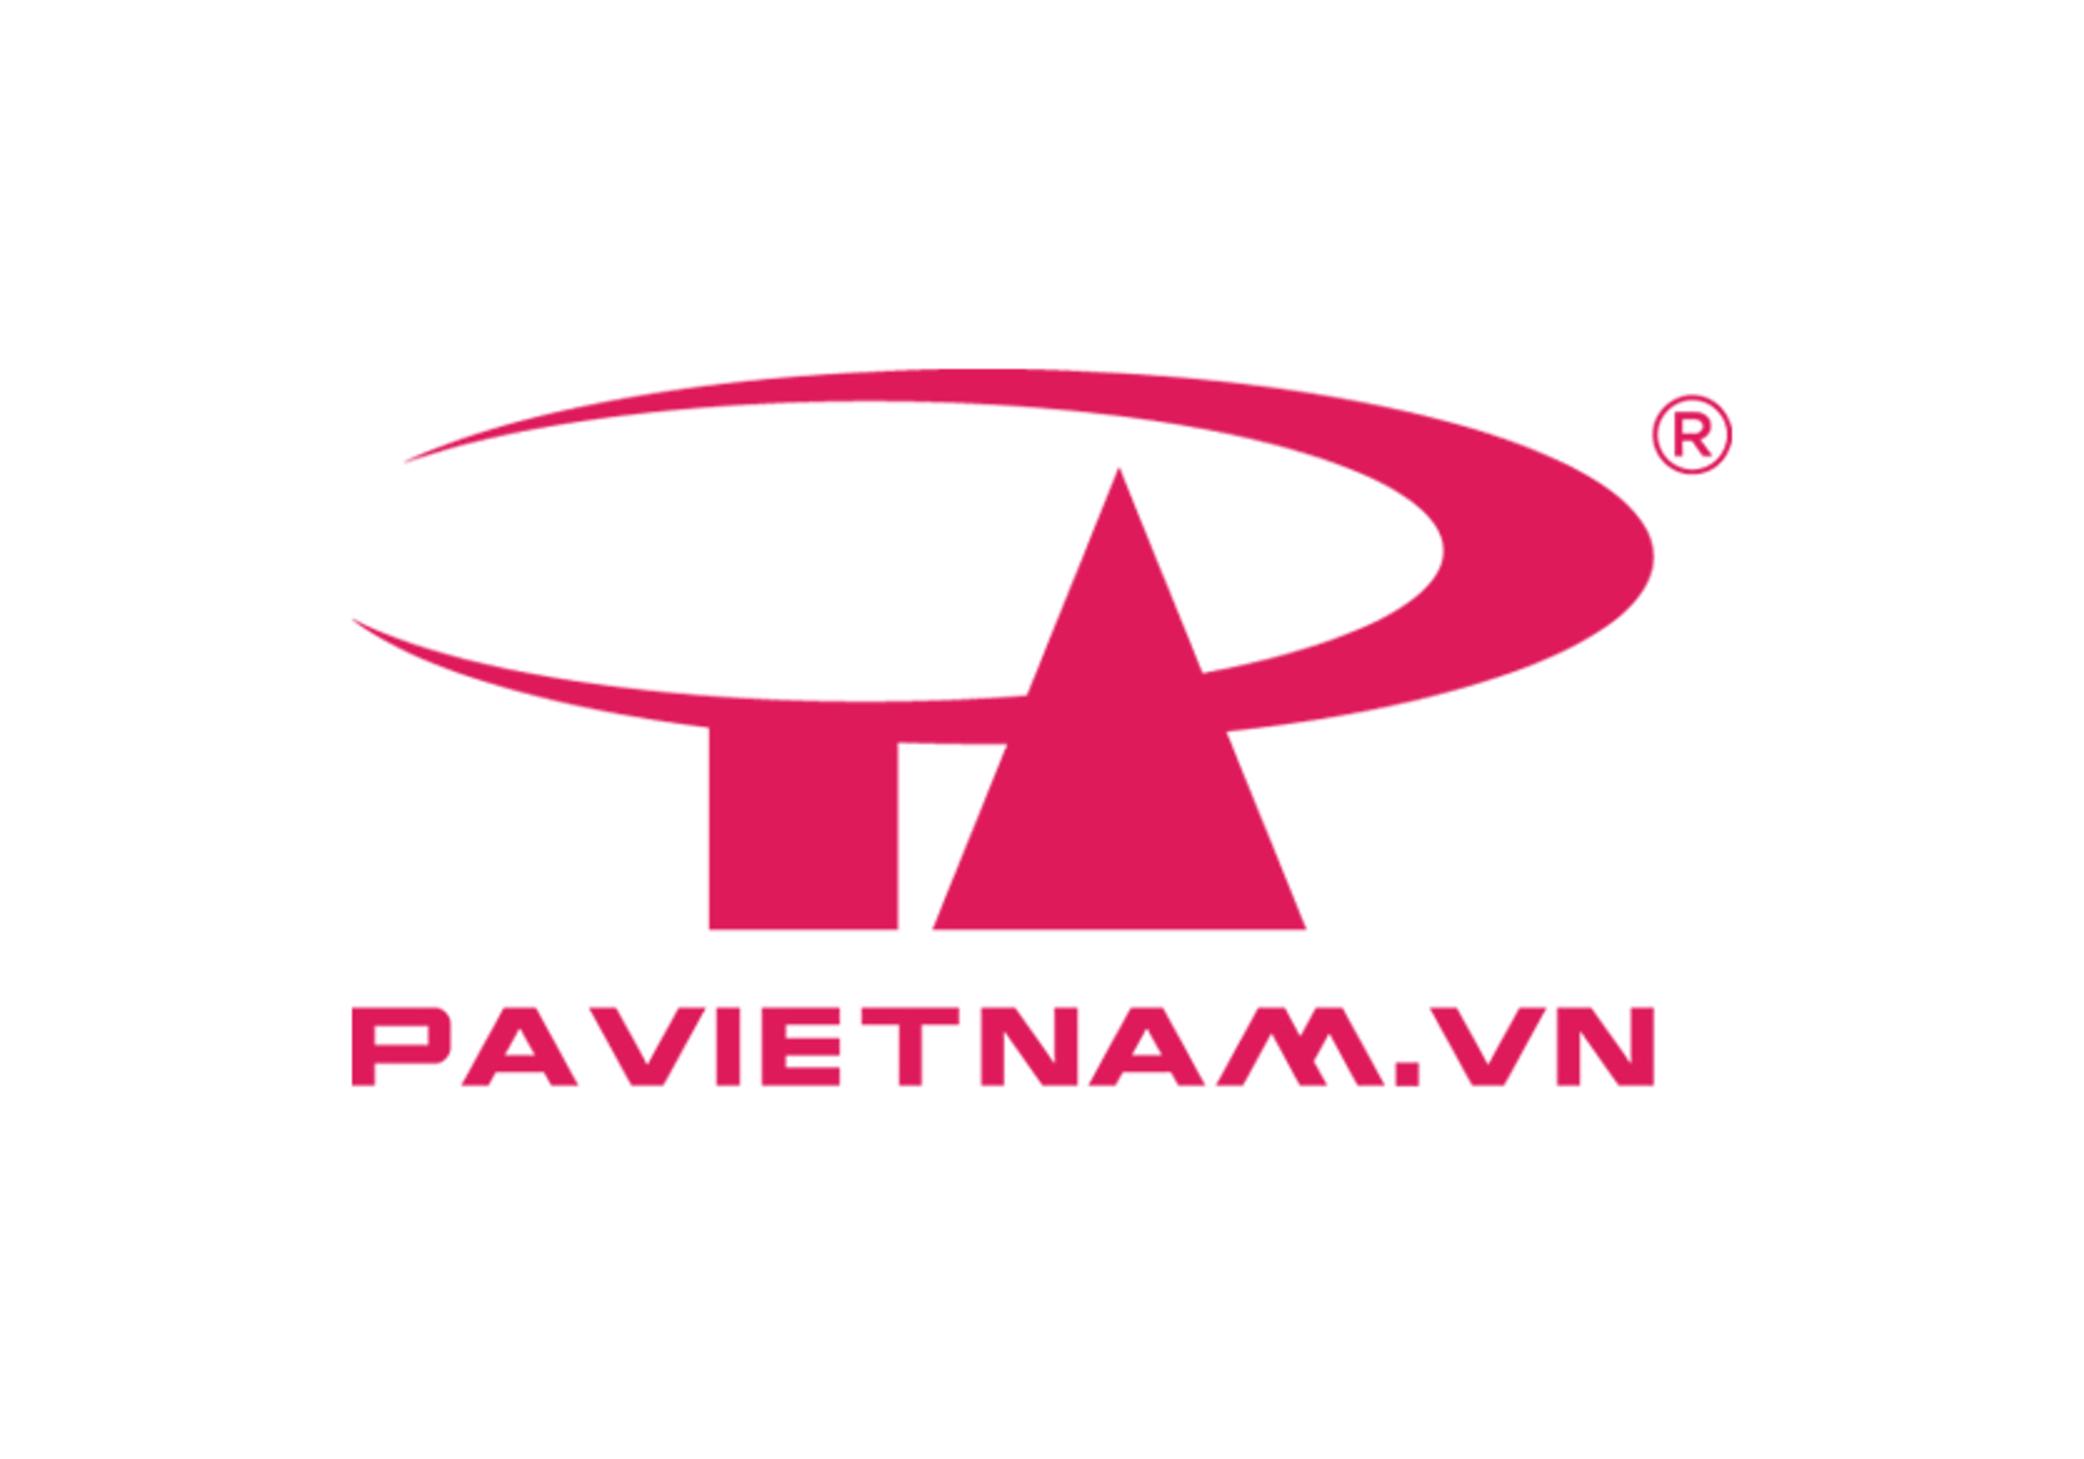 P.A Viet Nam